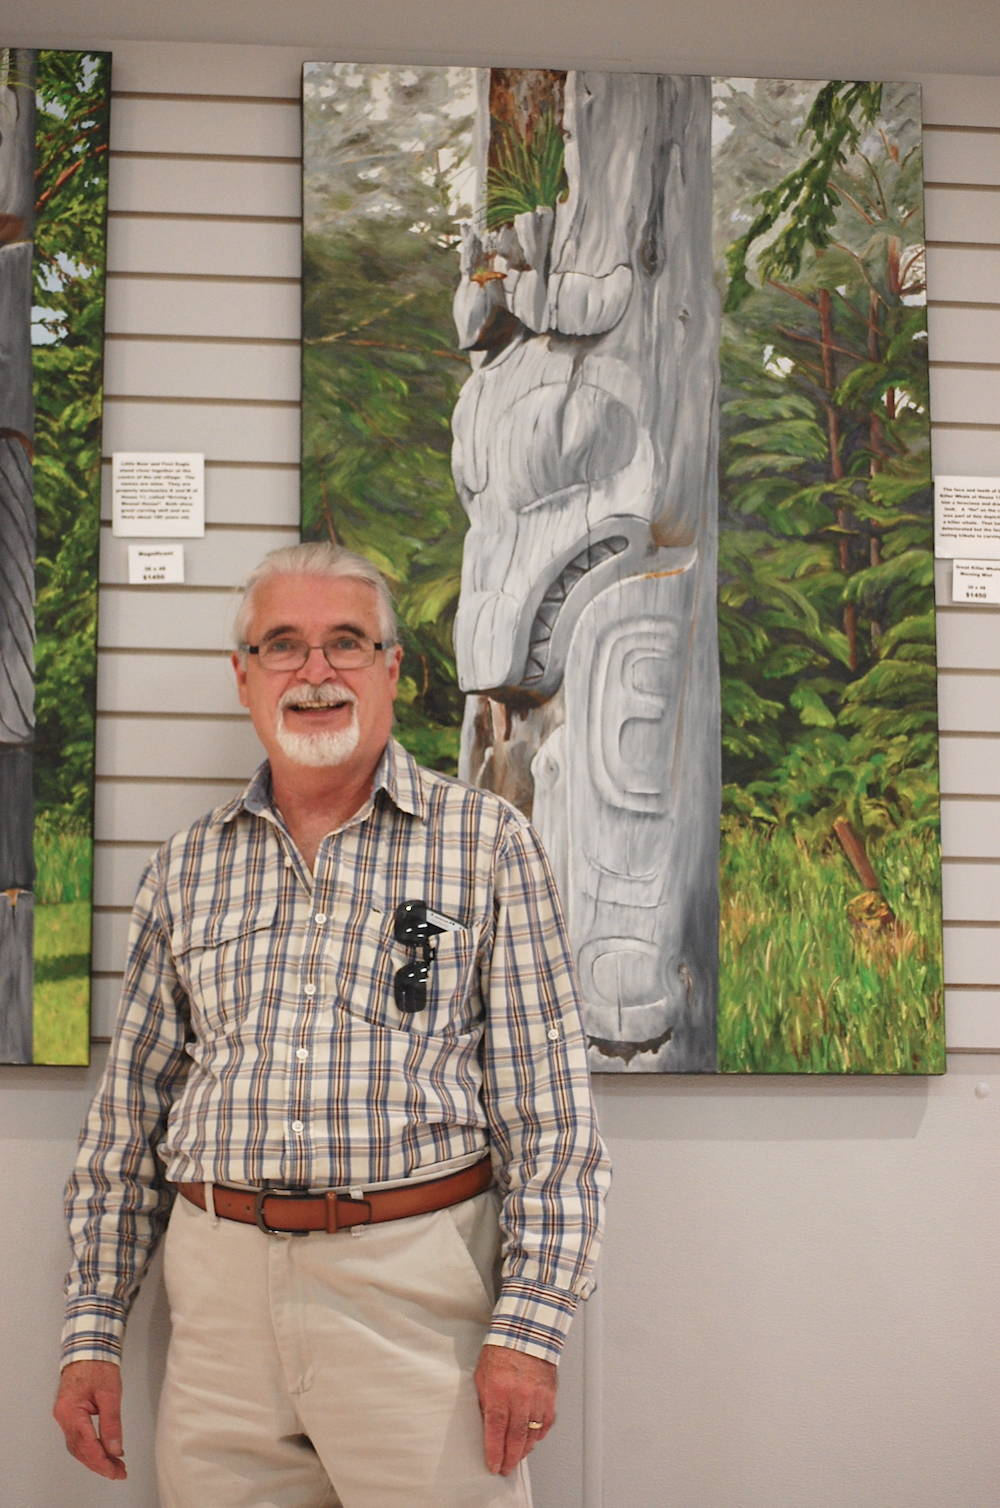 Langley Art Council's newest exhibit examines 'invasive species'